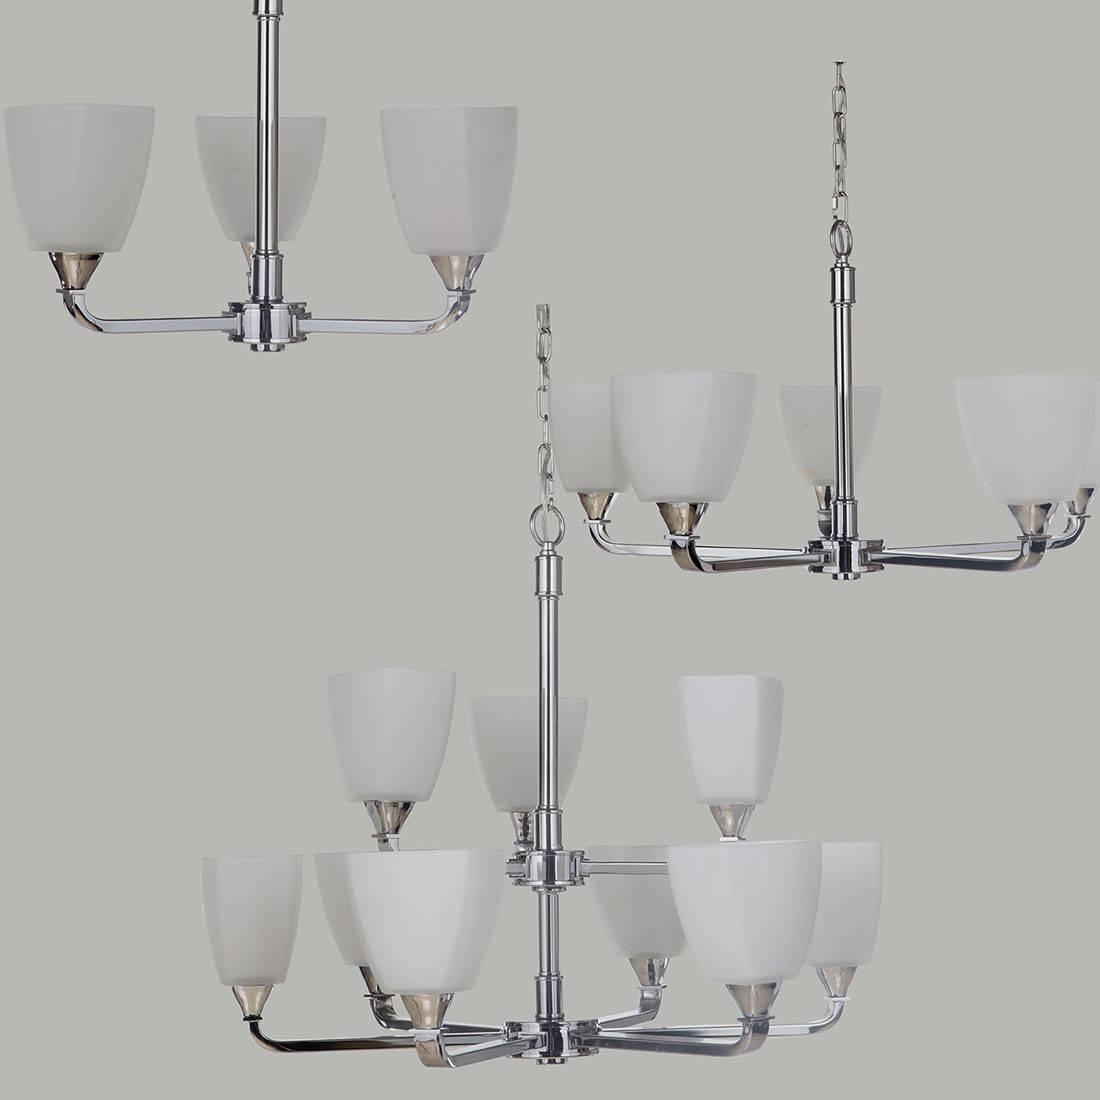 Designer Chandelier Lighting | Rustic Chandeliers Australia Inside Pendant Lights Base Plate (View 8 of 15)